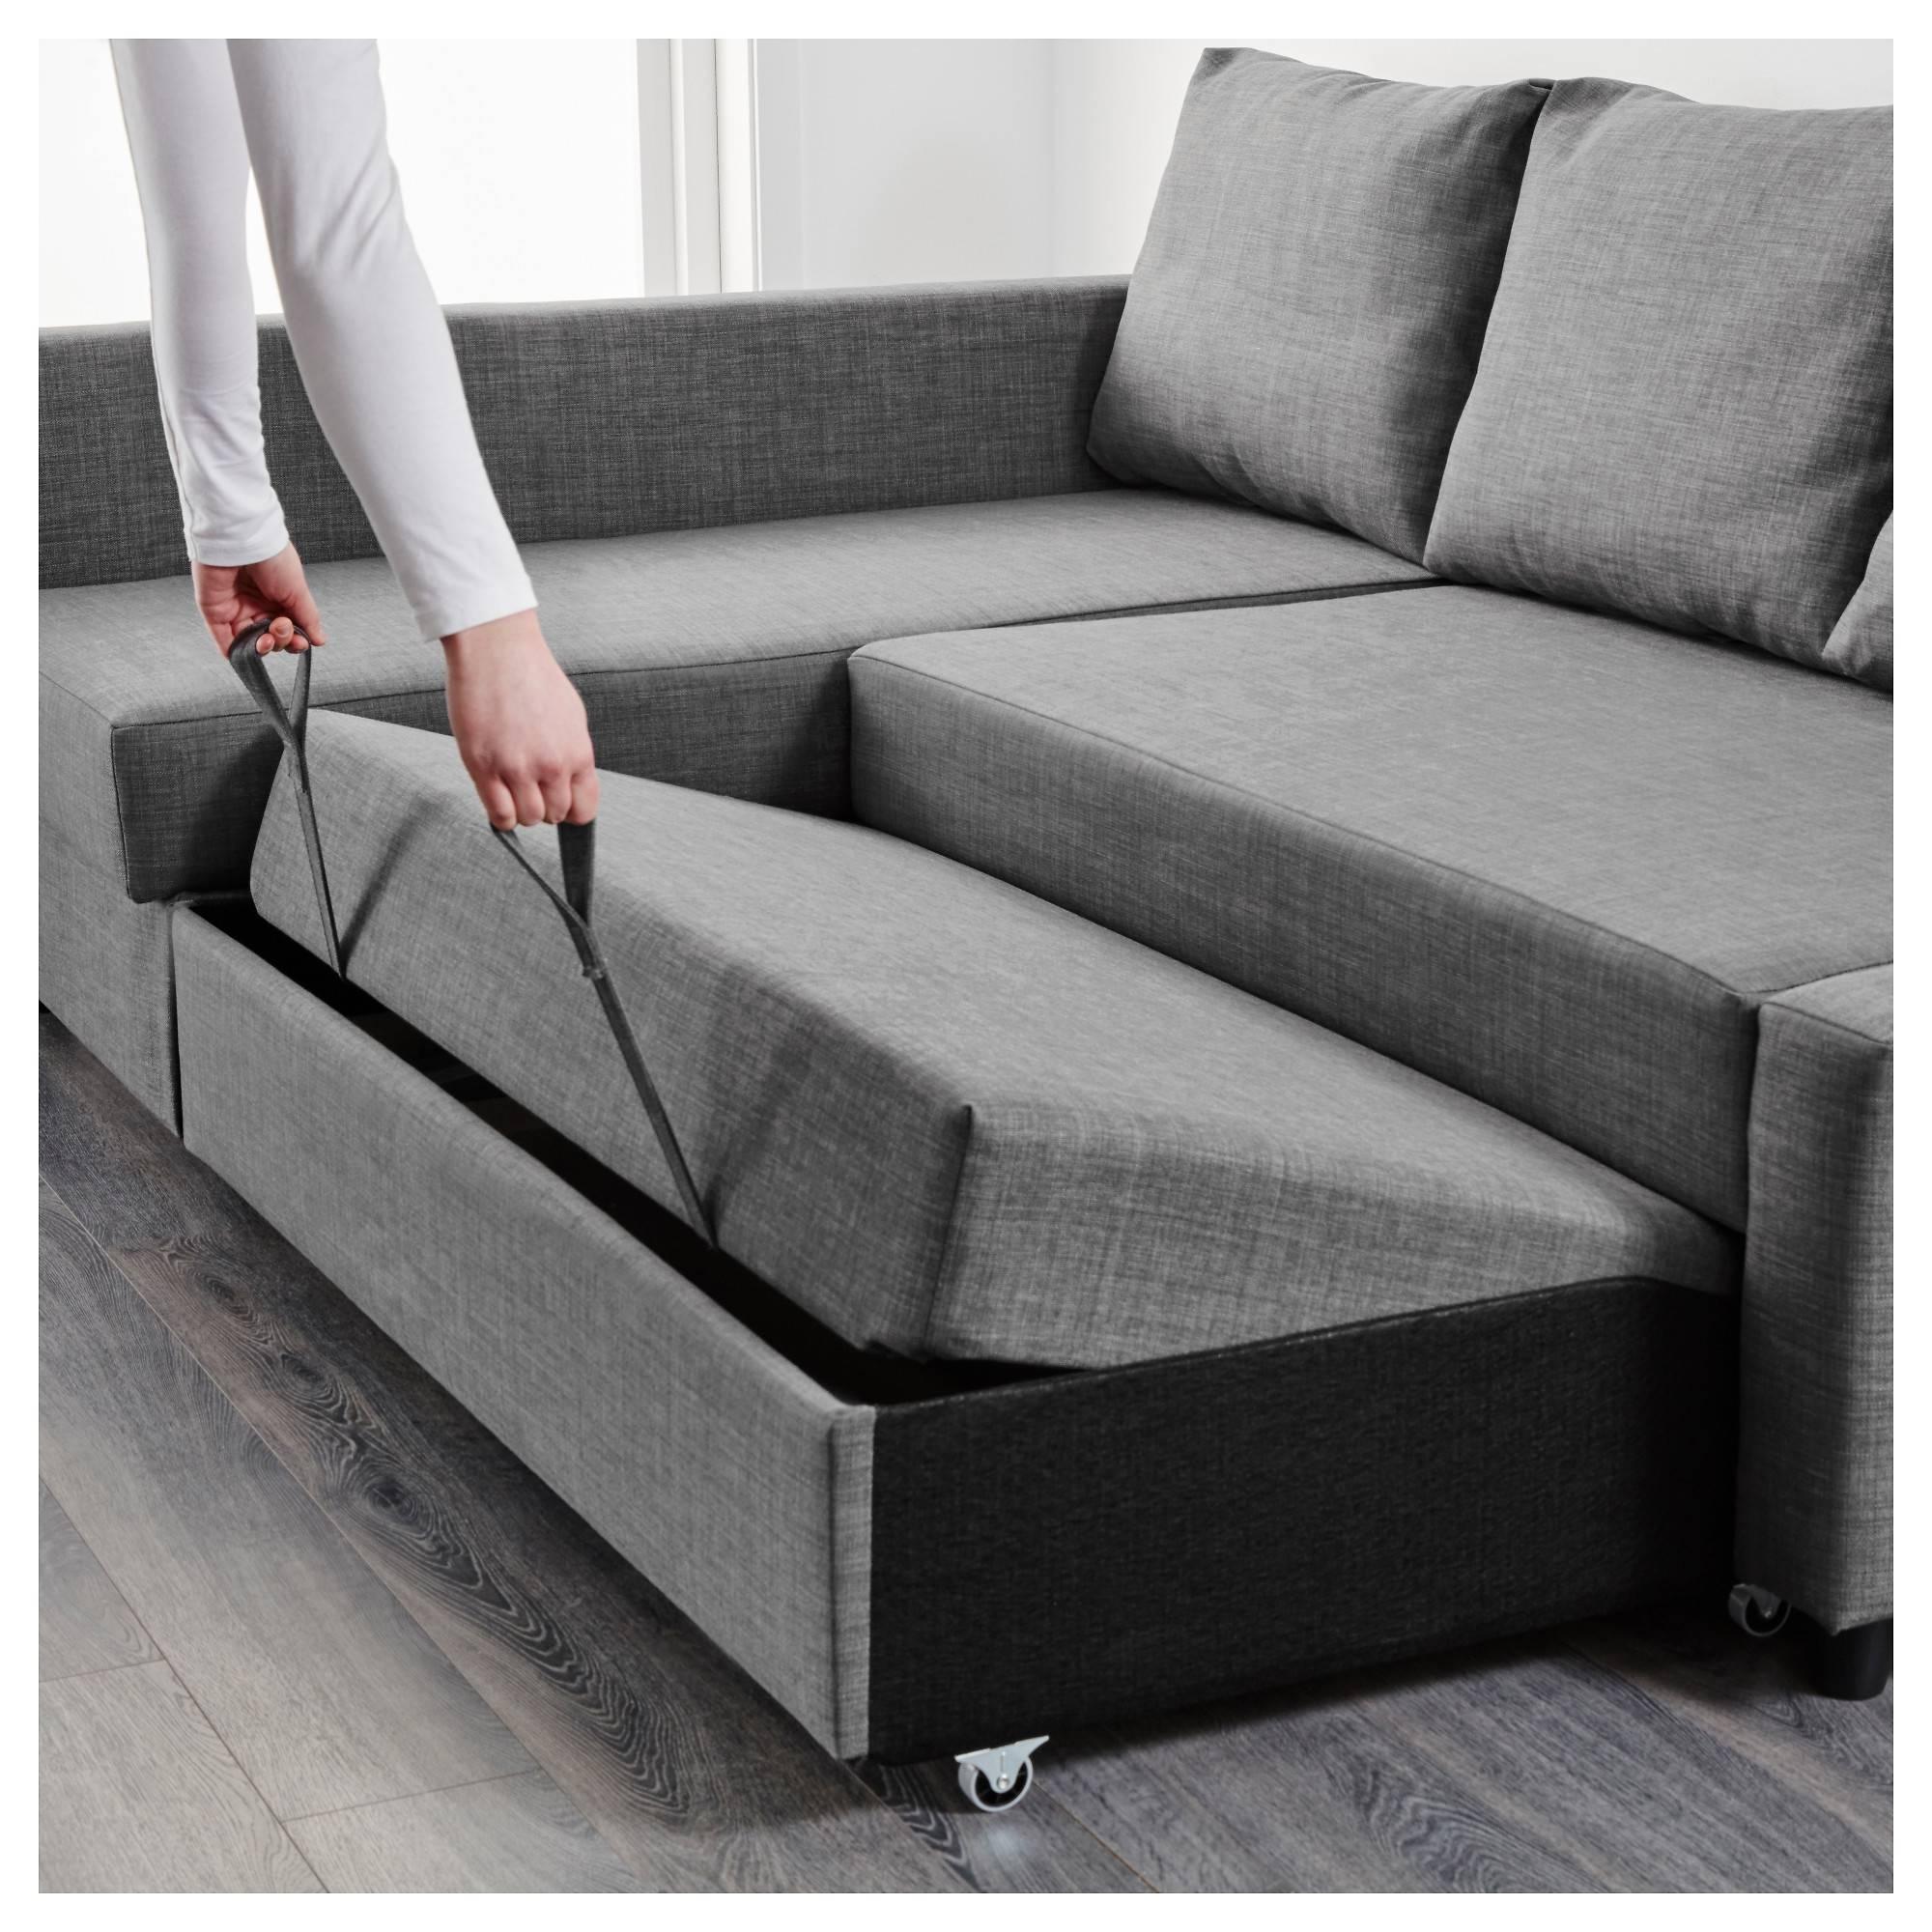 Friheten Corner Sofa-Bed With Storage Skiftebo Dark Grey - Ikea pertaining to Storage Sofas Ikea (Image 9 of 25)